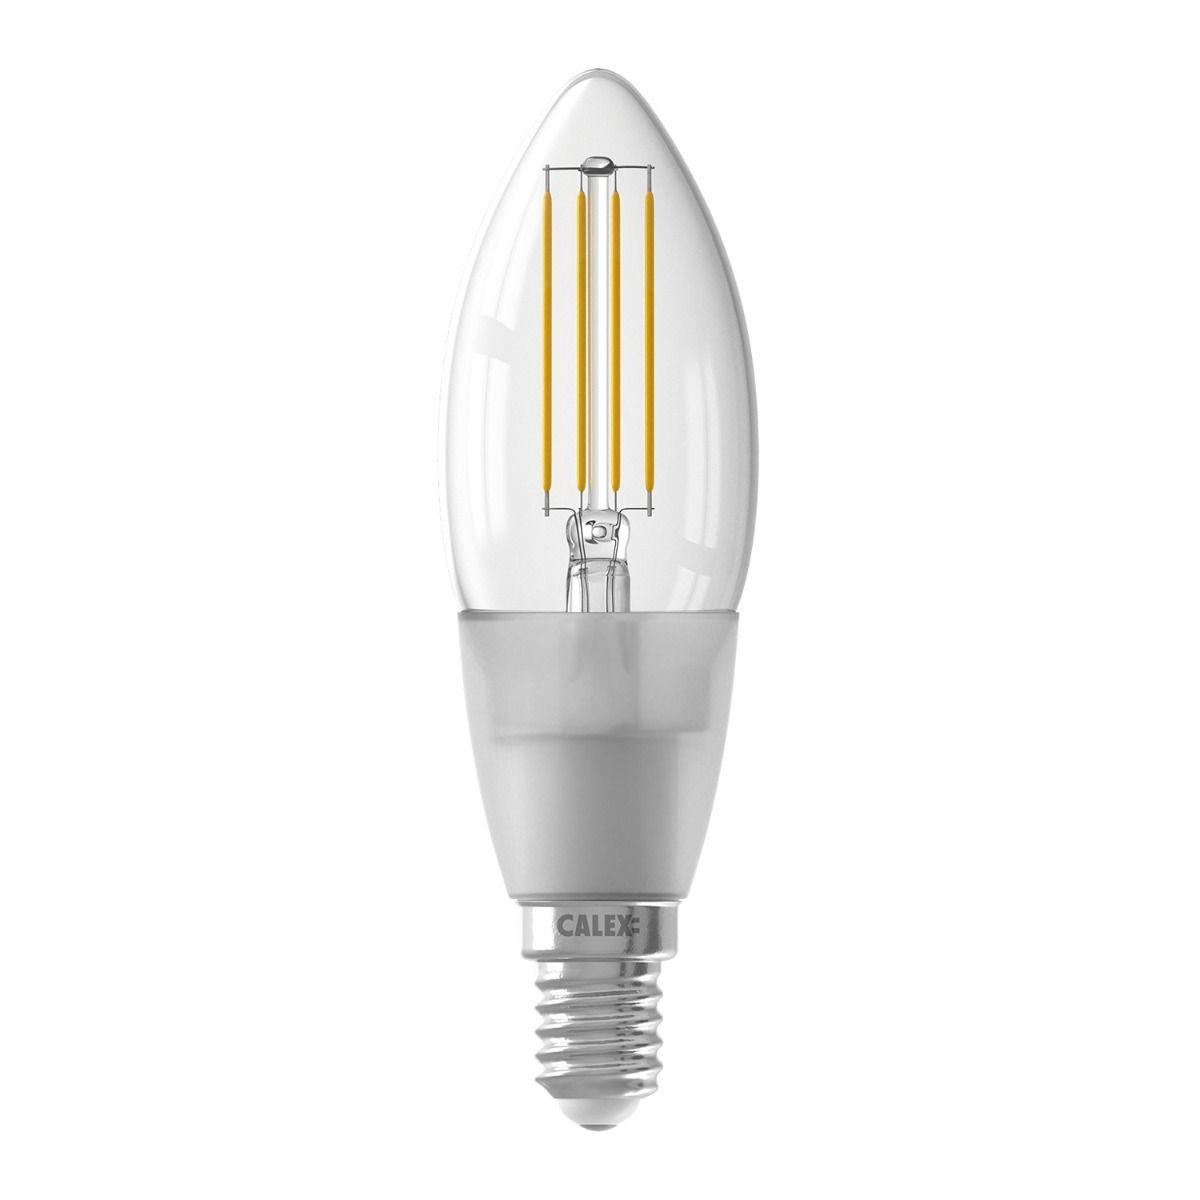 Calex Smart Kerze LED Glühbirne E14 4,5W 450lm 1800-3000K Fadenlampe | Tuya Wifi